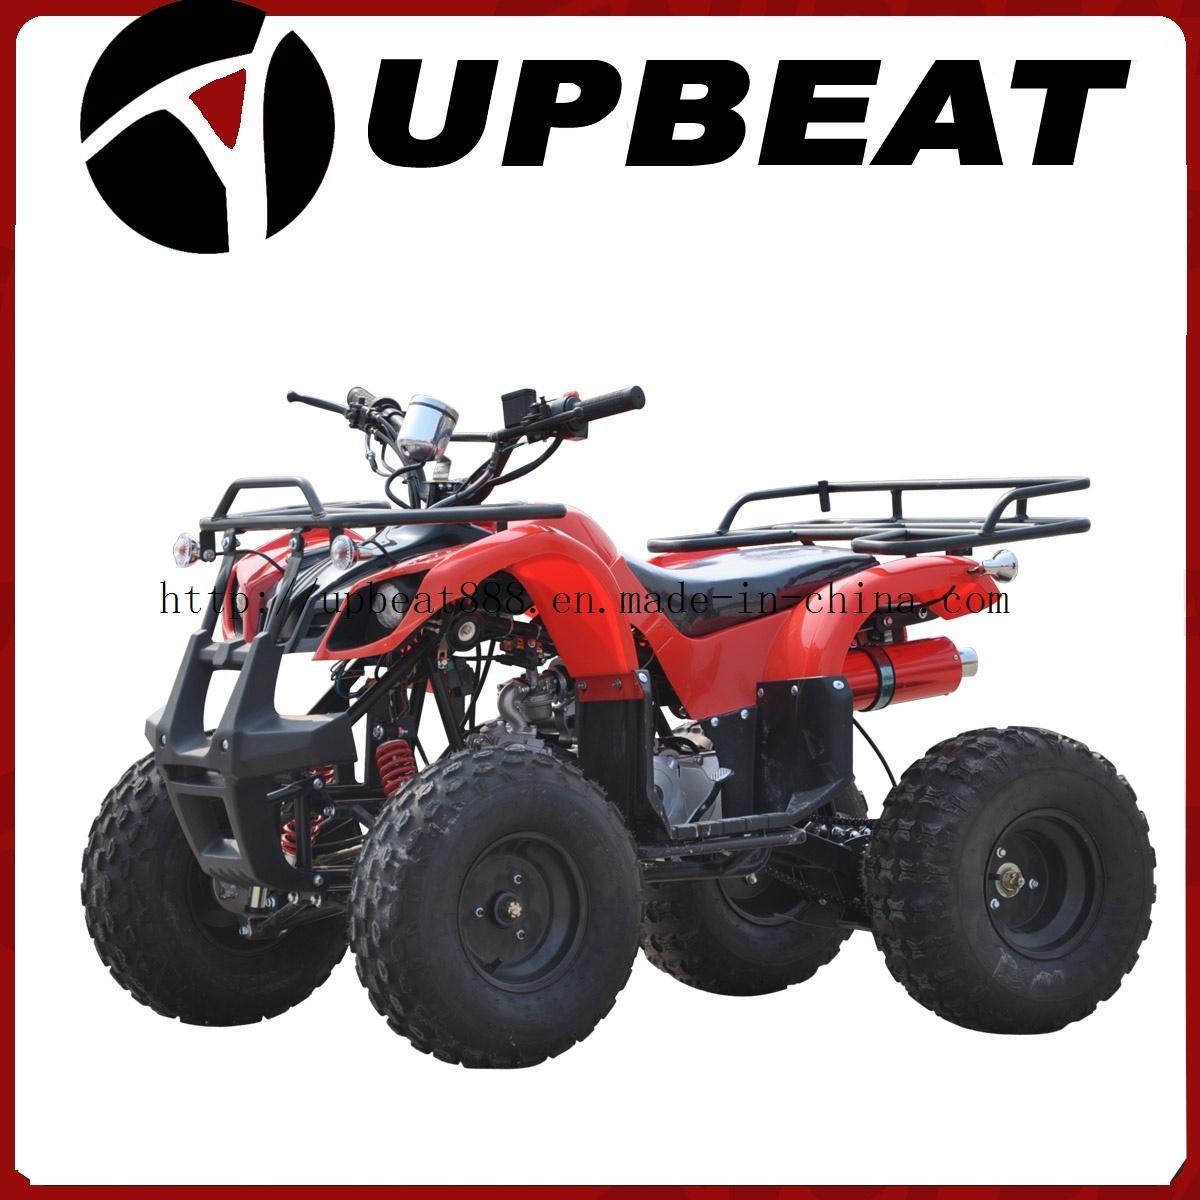 [Hot Item] 110cc ATV 110cc Quad Bike 125cc ATV with Reverse